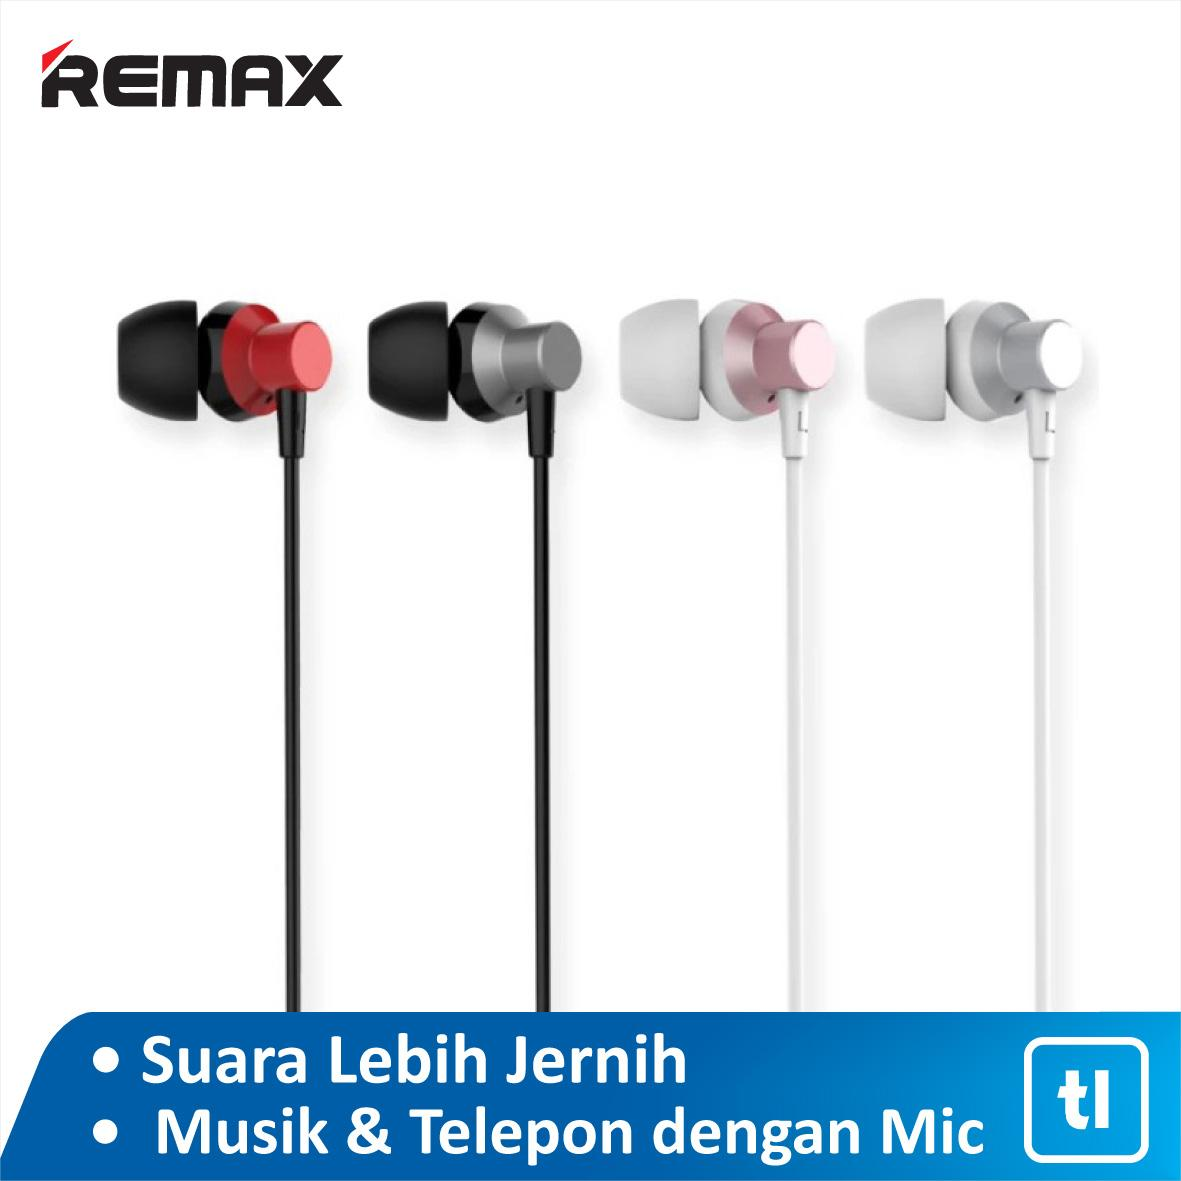 Remax RM 512 HD Metal Headset Earphone Microphone Garansi Resmi / Earphone Murah / Earphone Terbaik